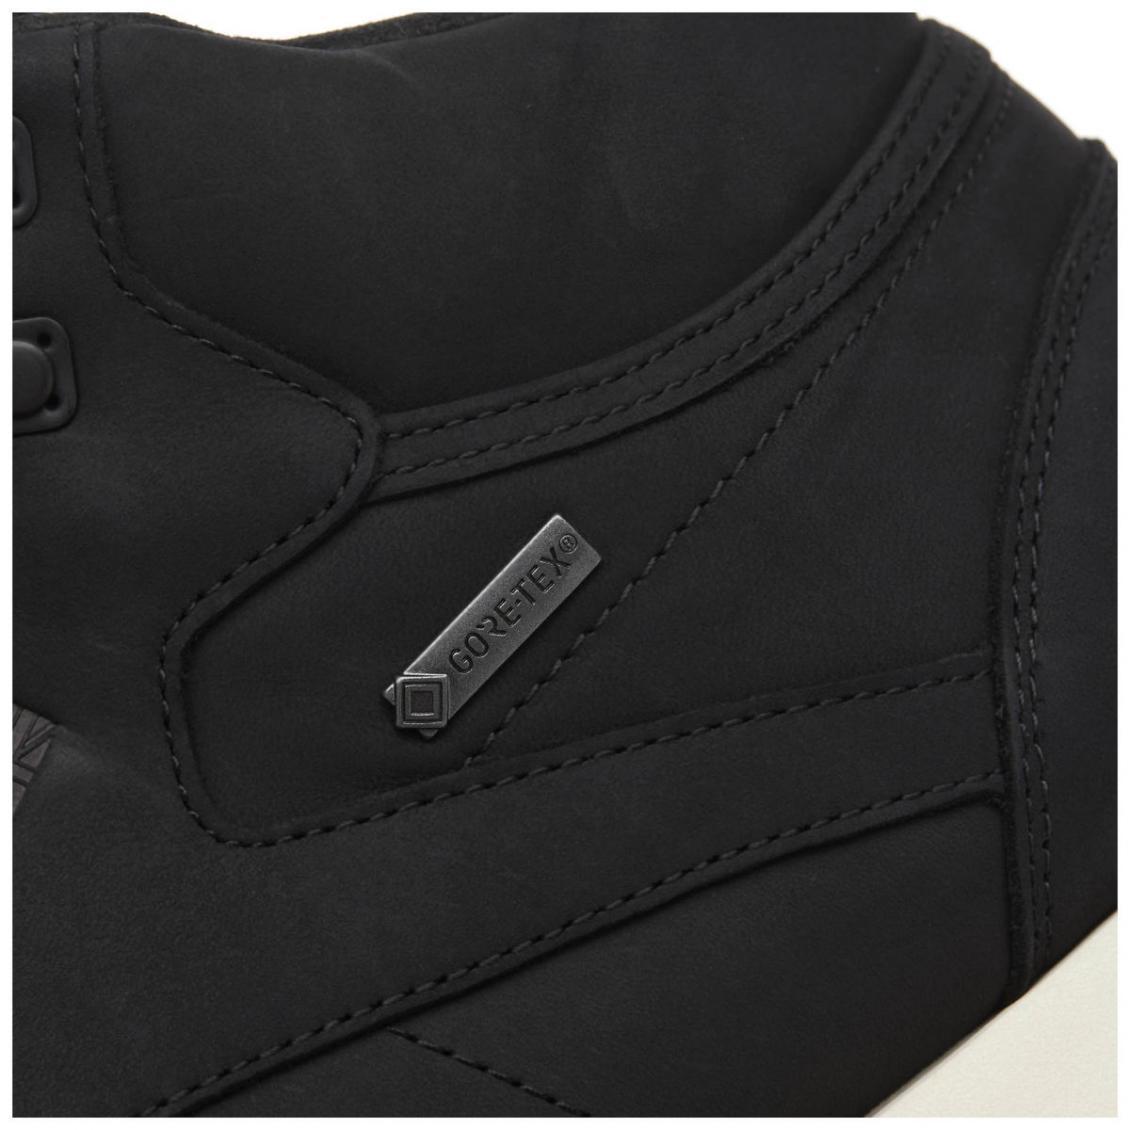 Black – Reebok Classic Leather Mid GTX-THIN Mens Black / Paper White / Gum